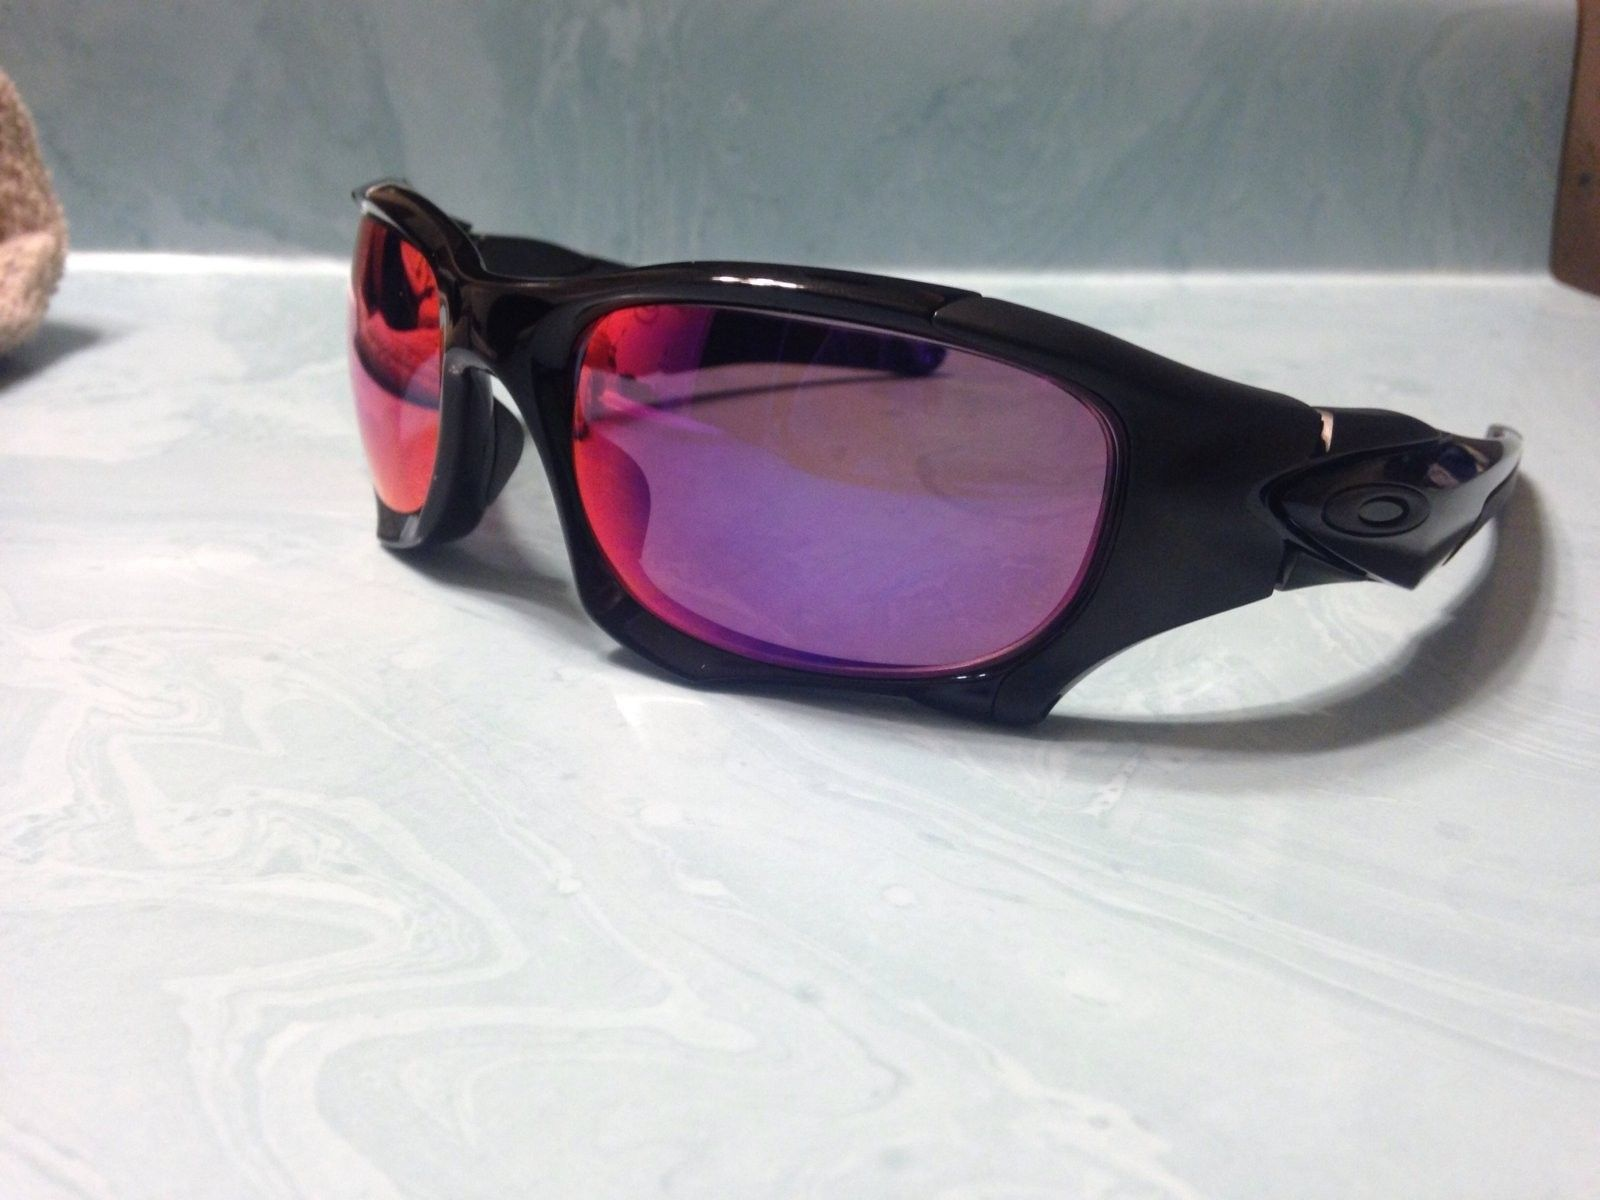 What lenses should I put in a matte black PB2? - image.jpeg